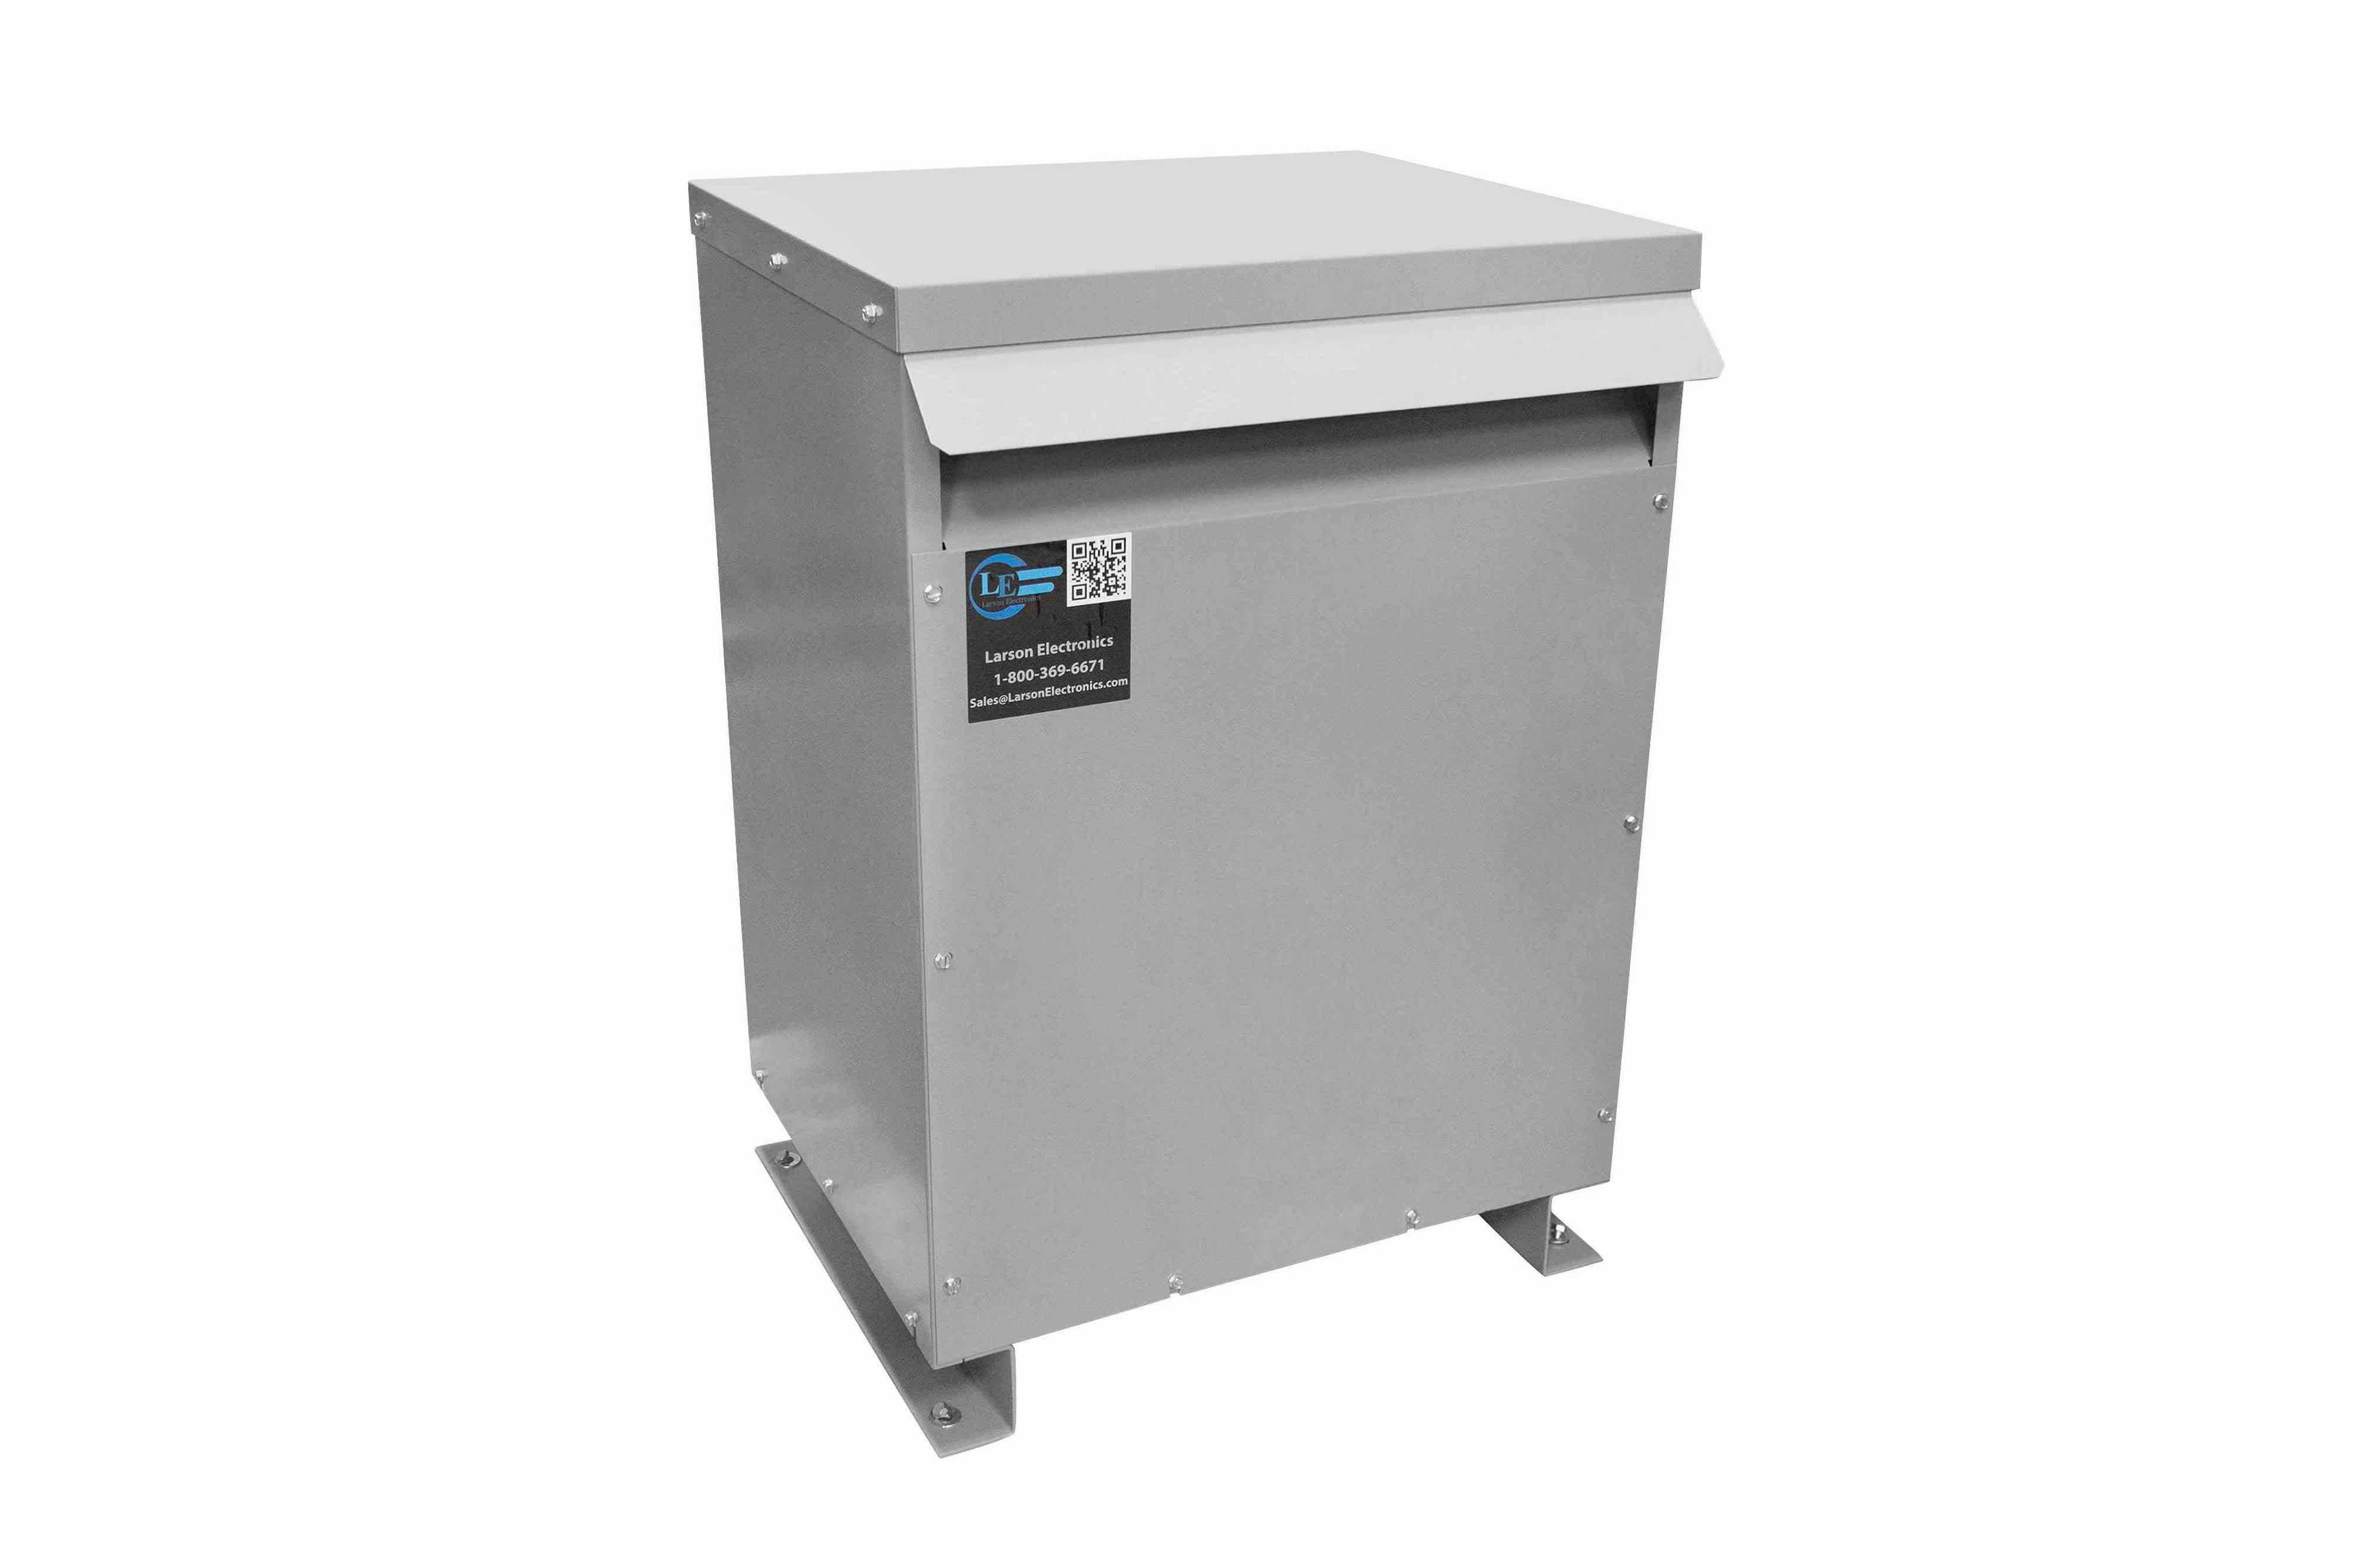 18 kVA 3PH Isolation Transformer, 480V Wye Primary, 240V/120 Delta Secondary, N3R, Ventilated, 60 Hz